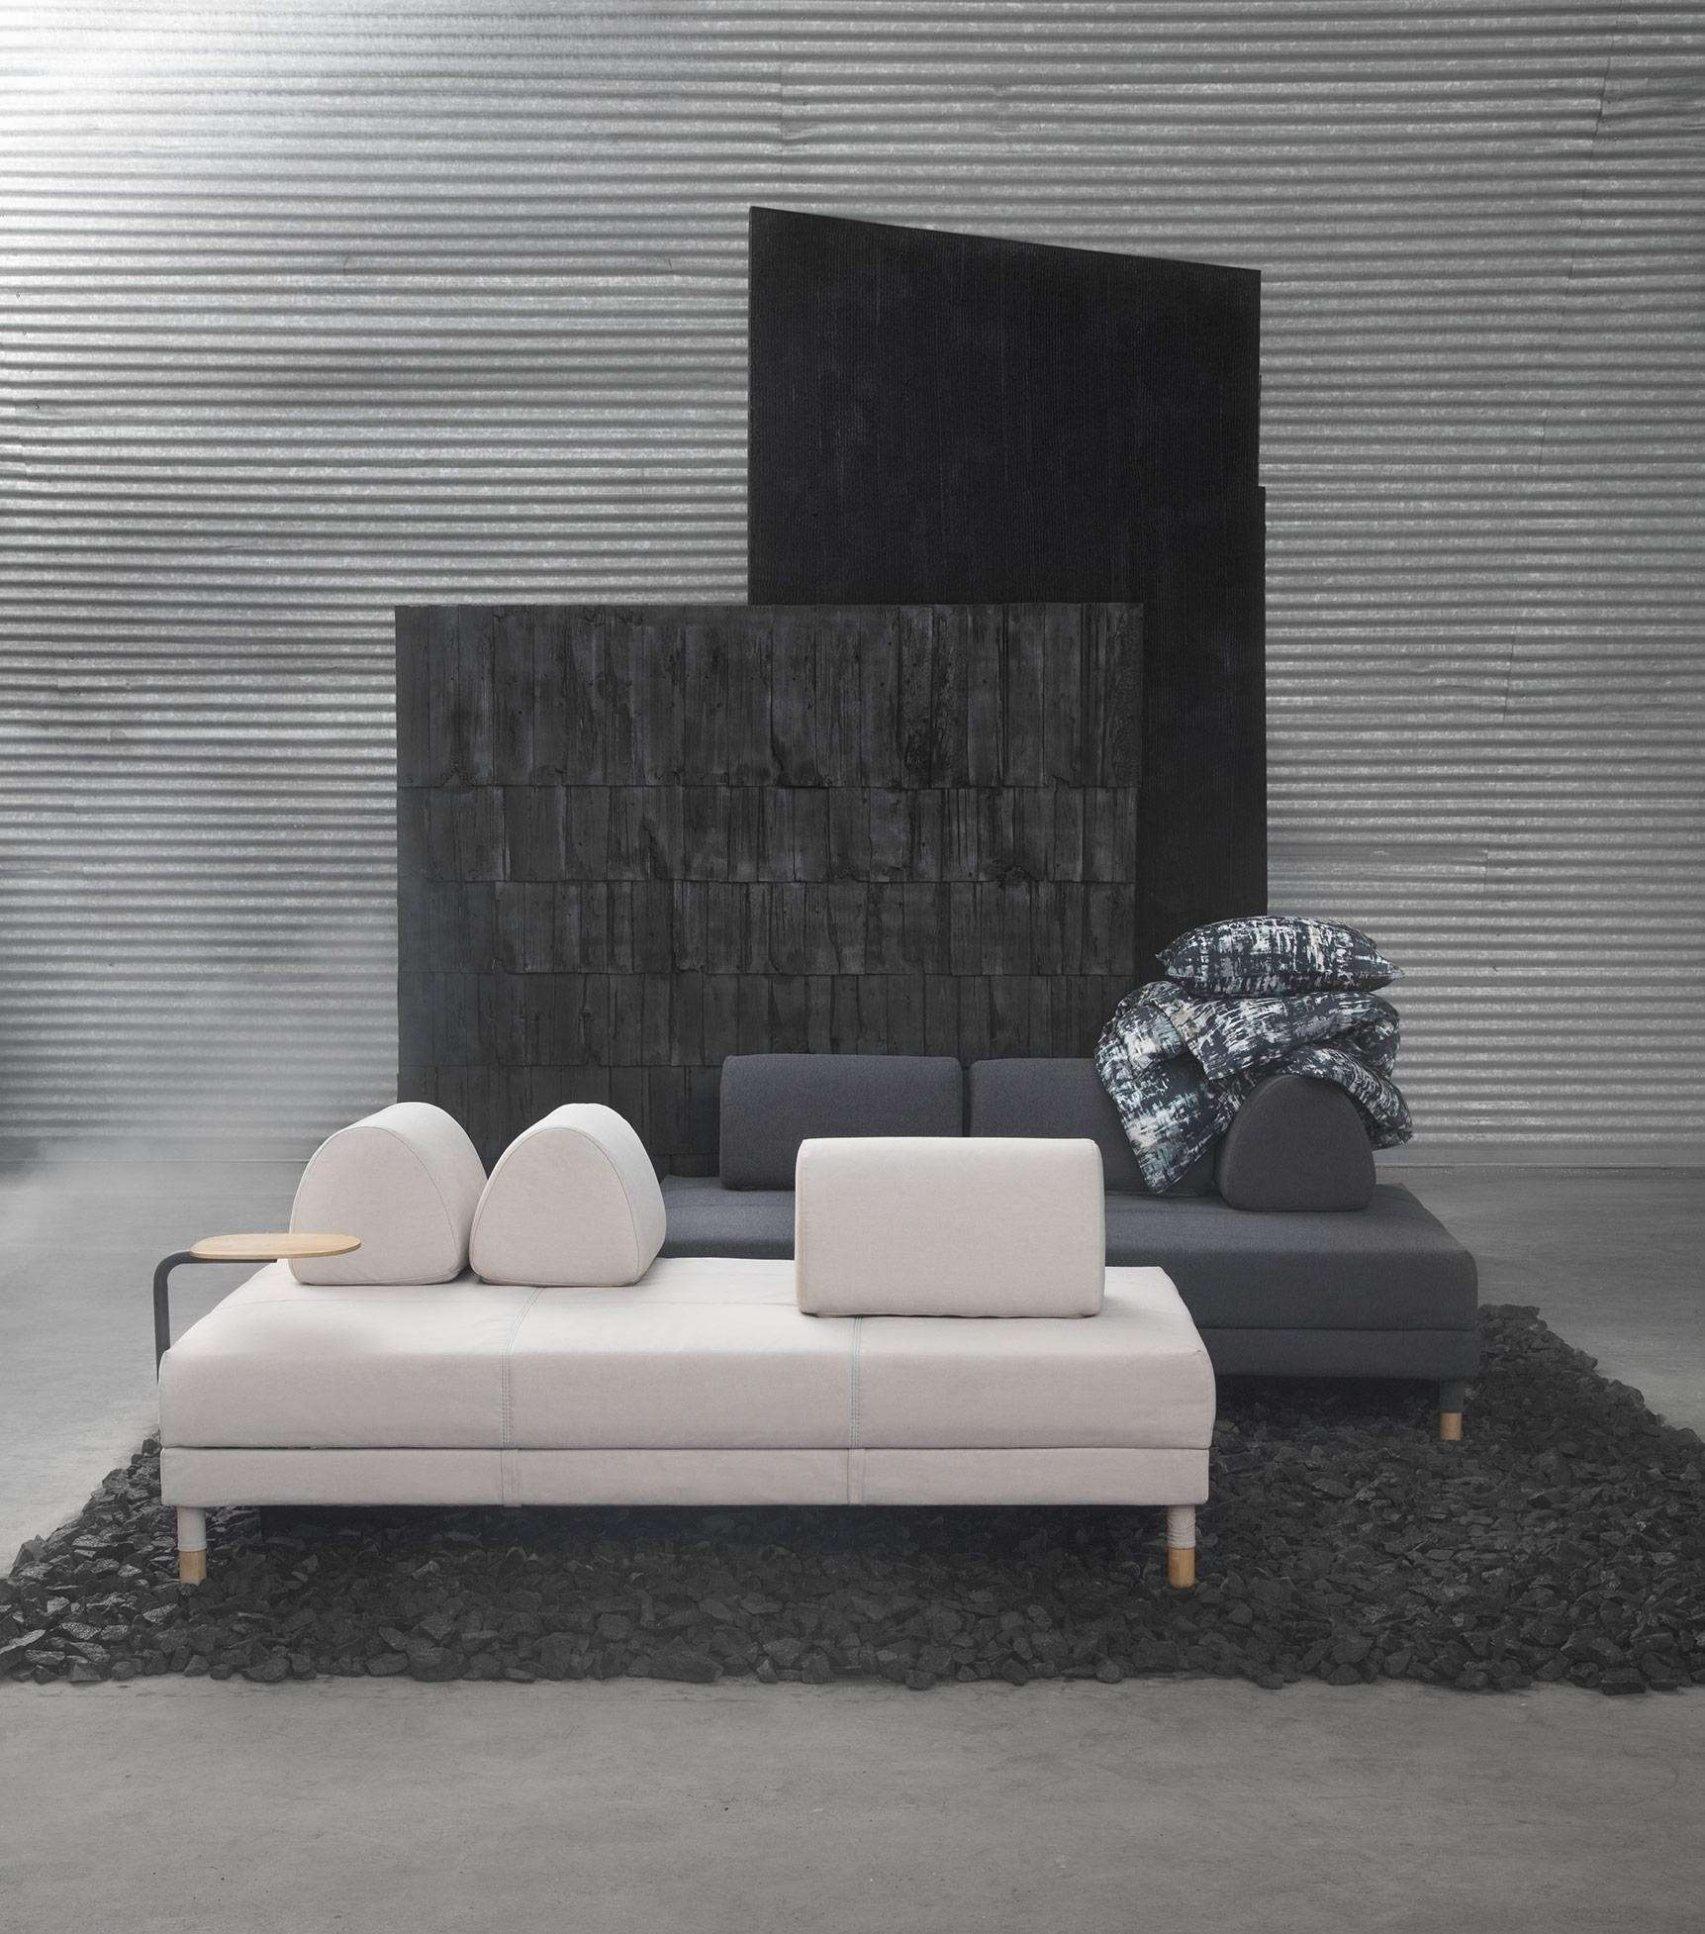 Lit En Hauteur Ikea Douce Maha De Lit Metal Blanc Mahagranda De Home